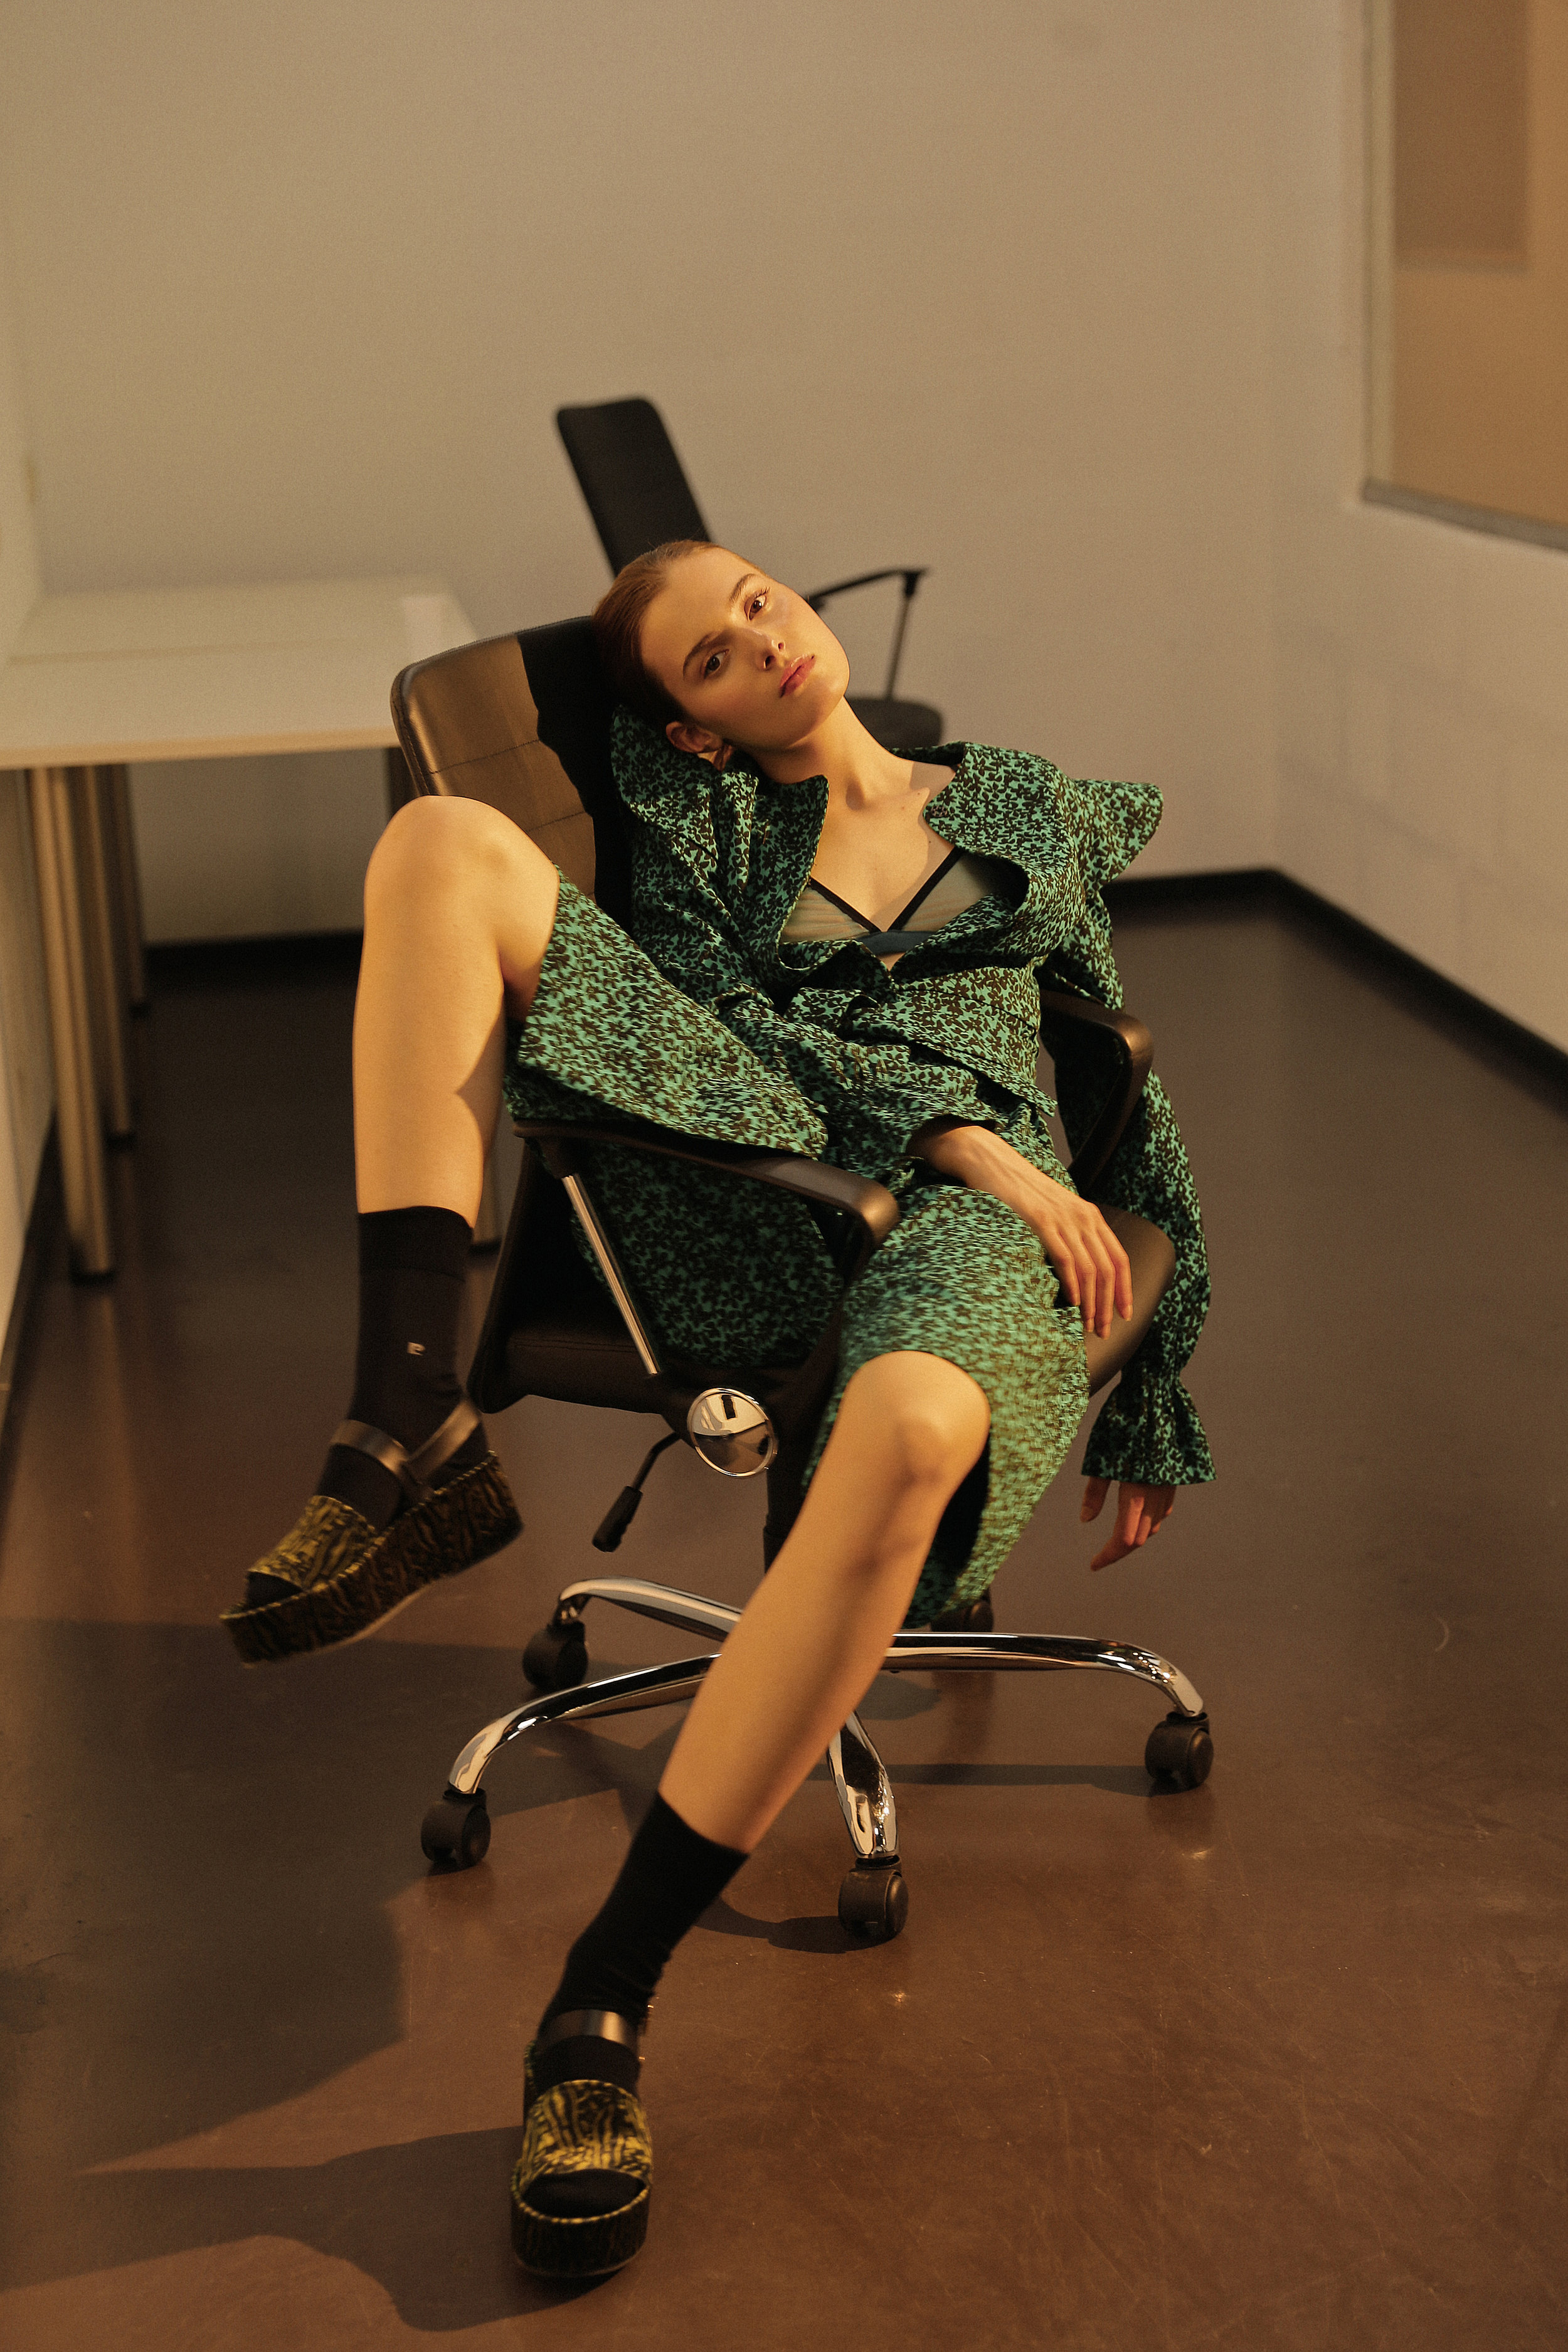 Dress Li-Lu, lingerie MOON Underwear, earring Christina Ramella, shoes Furla